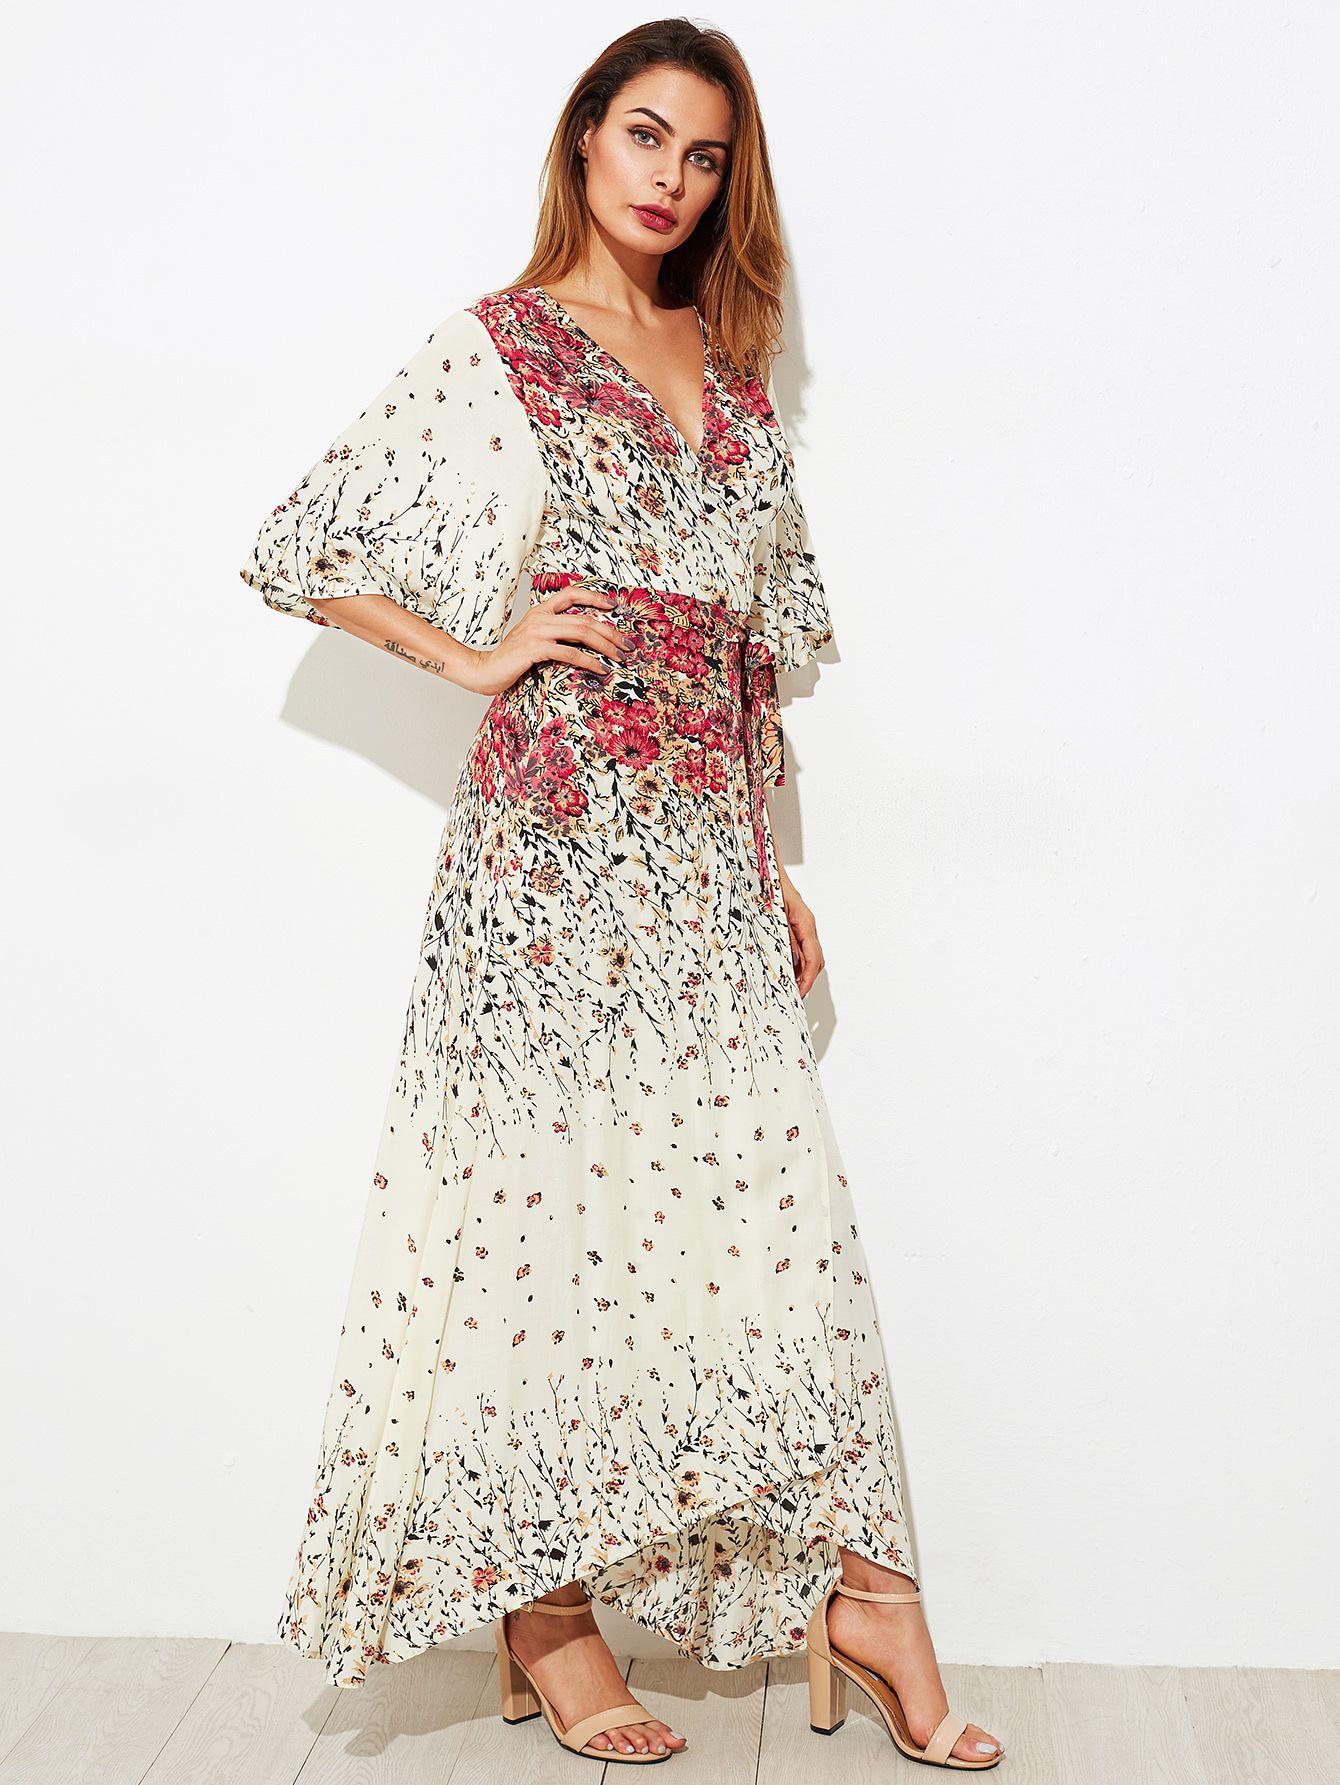 Flower Print Kimono Sleeve Surplice Wrap Dress Dresses Surplice Wrap Dress White Flower Print Dress [ 1785 x 1340 Pixel ]